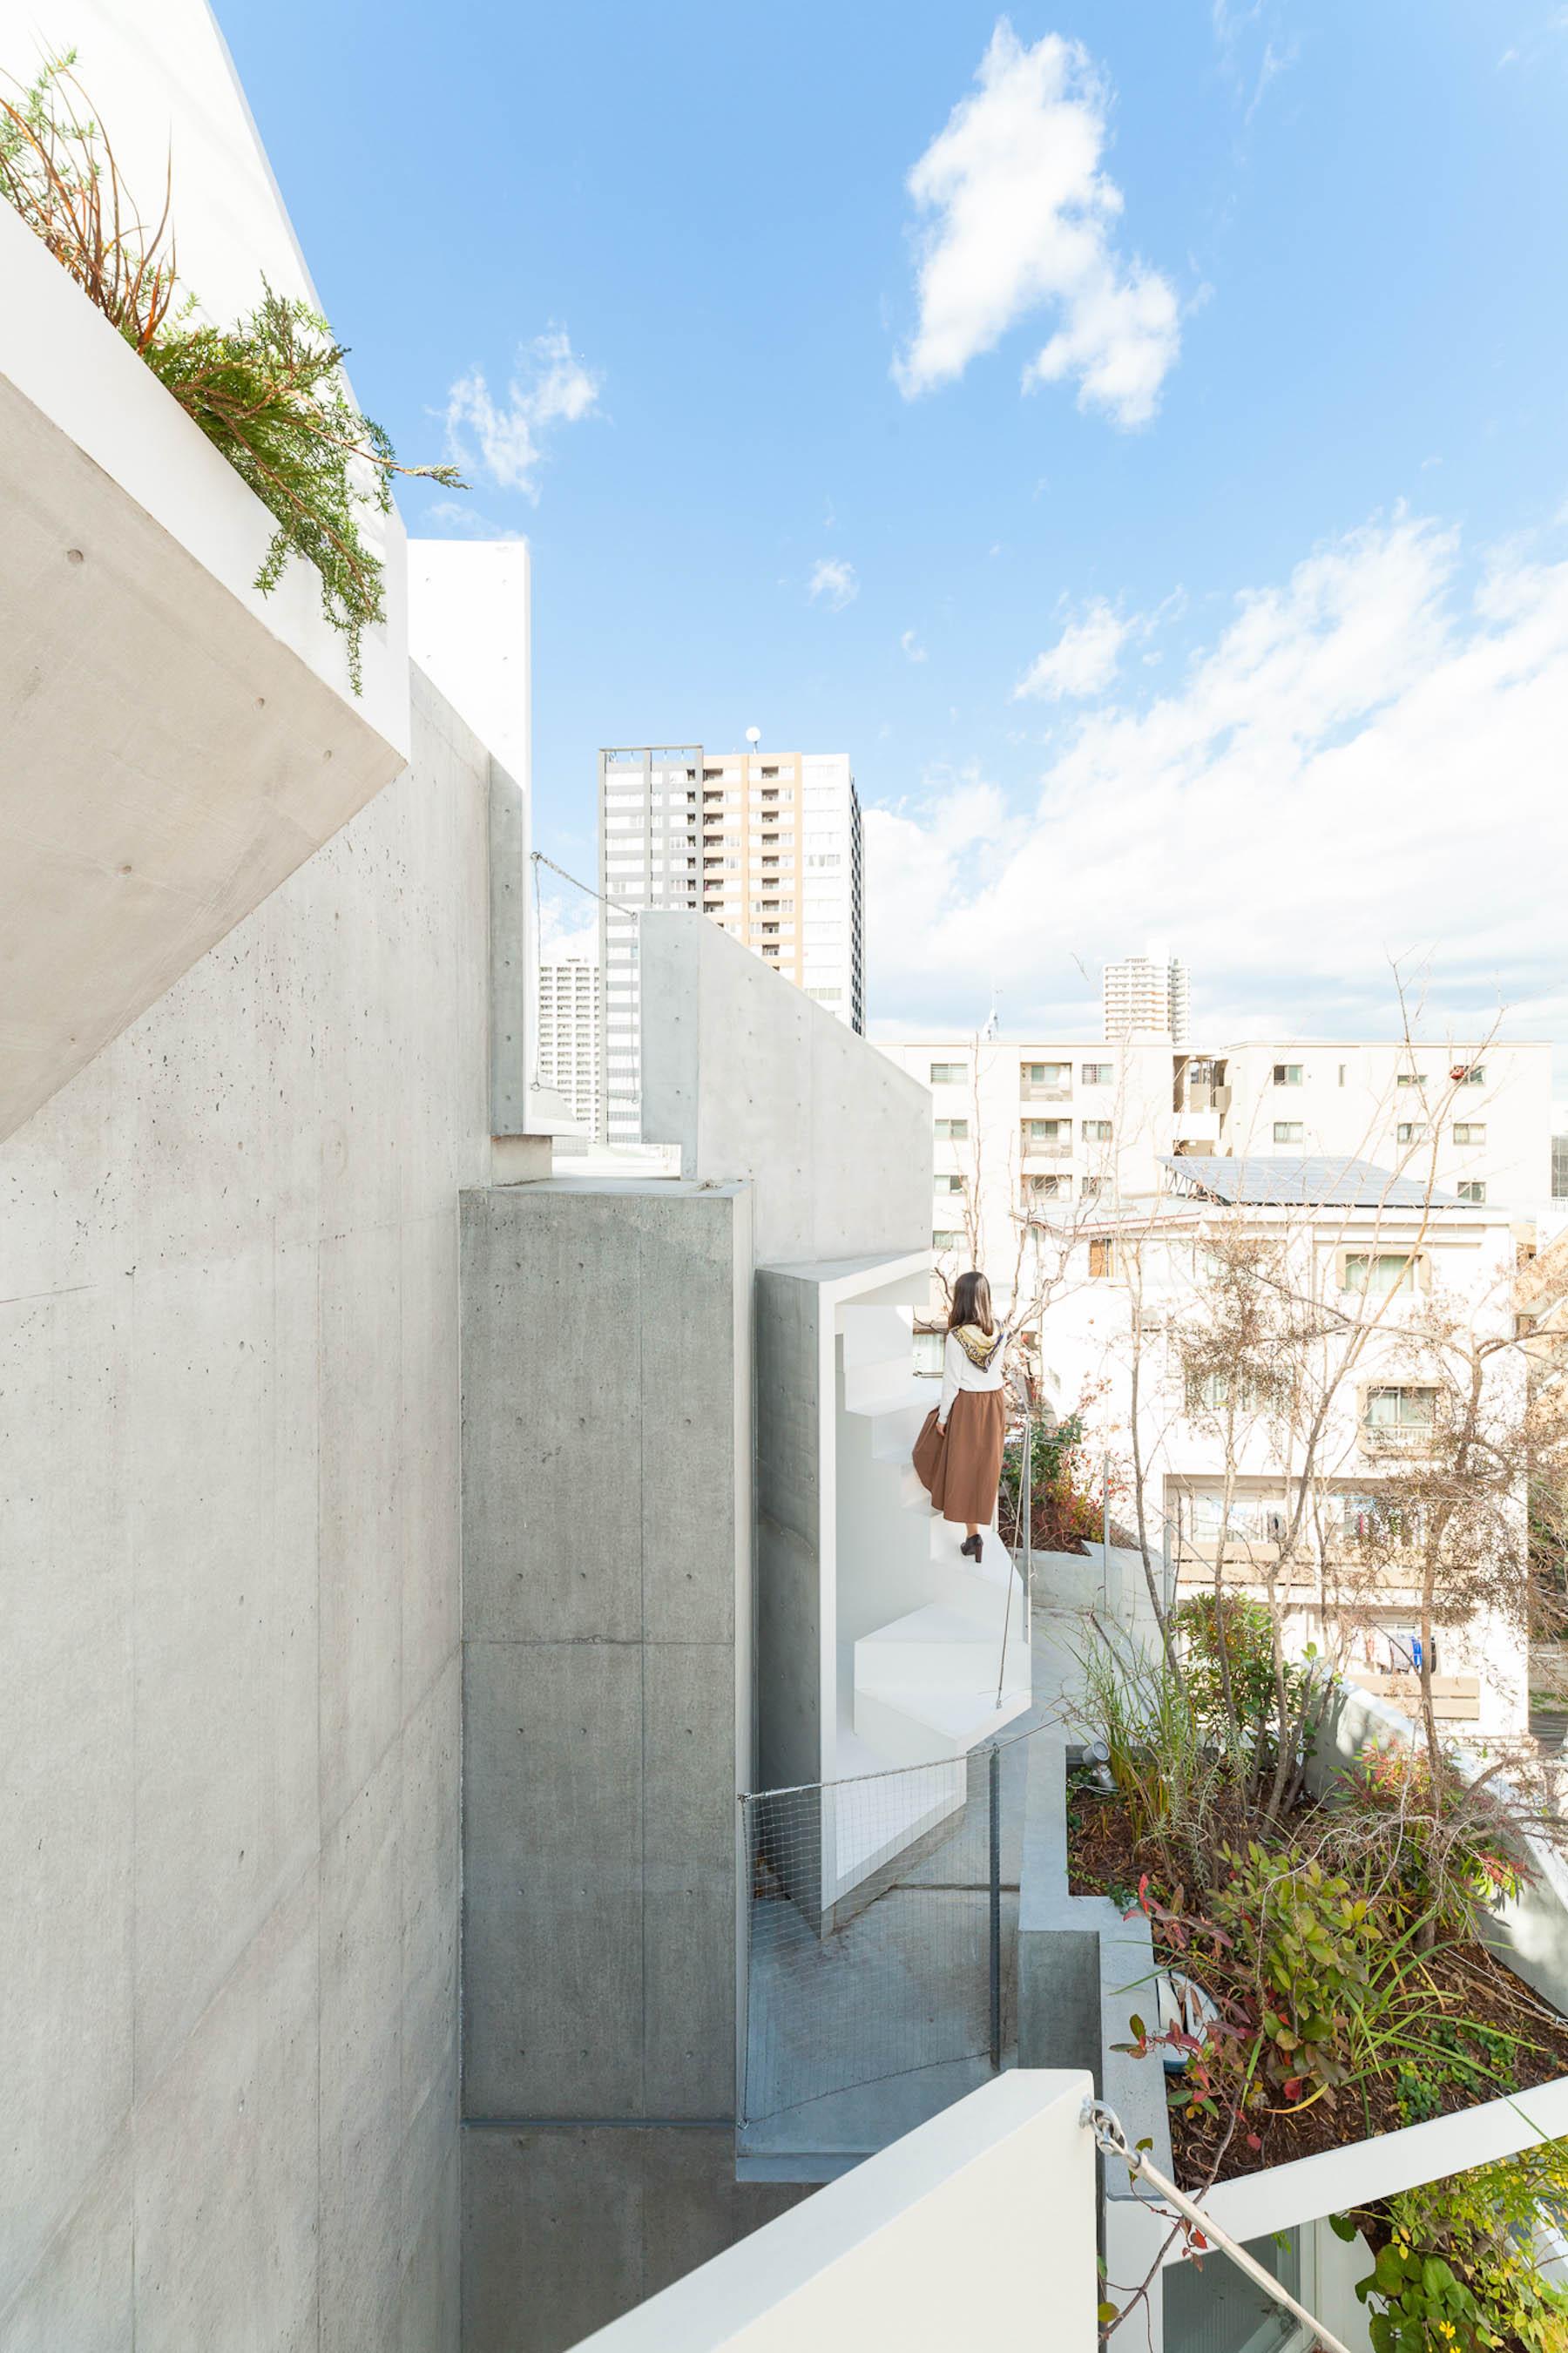 iGNANT-Architecture-Akihisa-Hirata-Tree-Ness-House-07